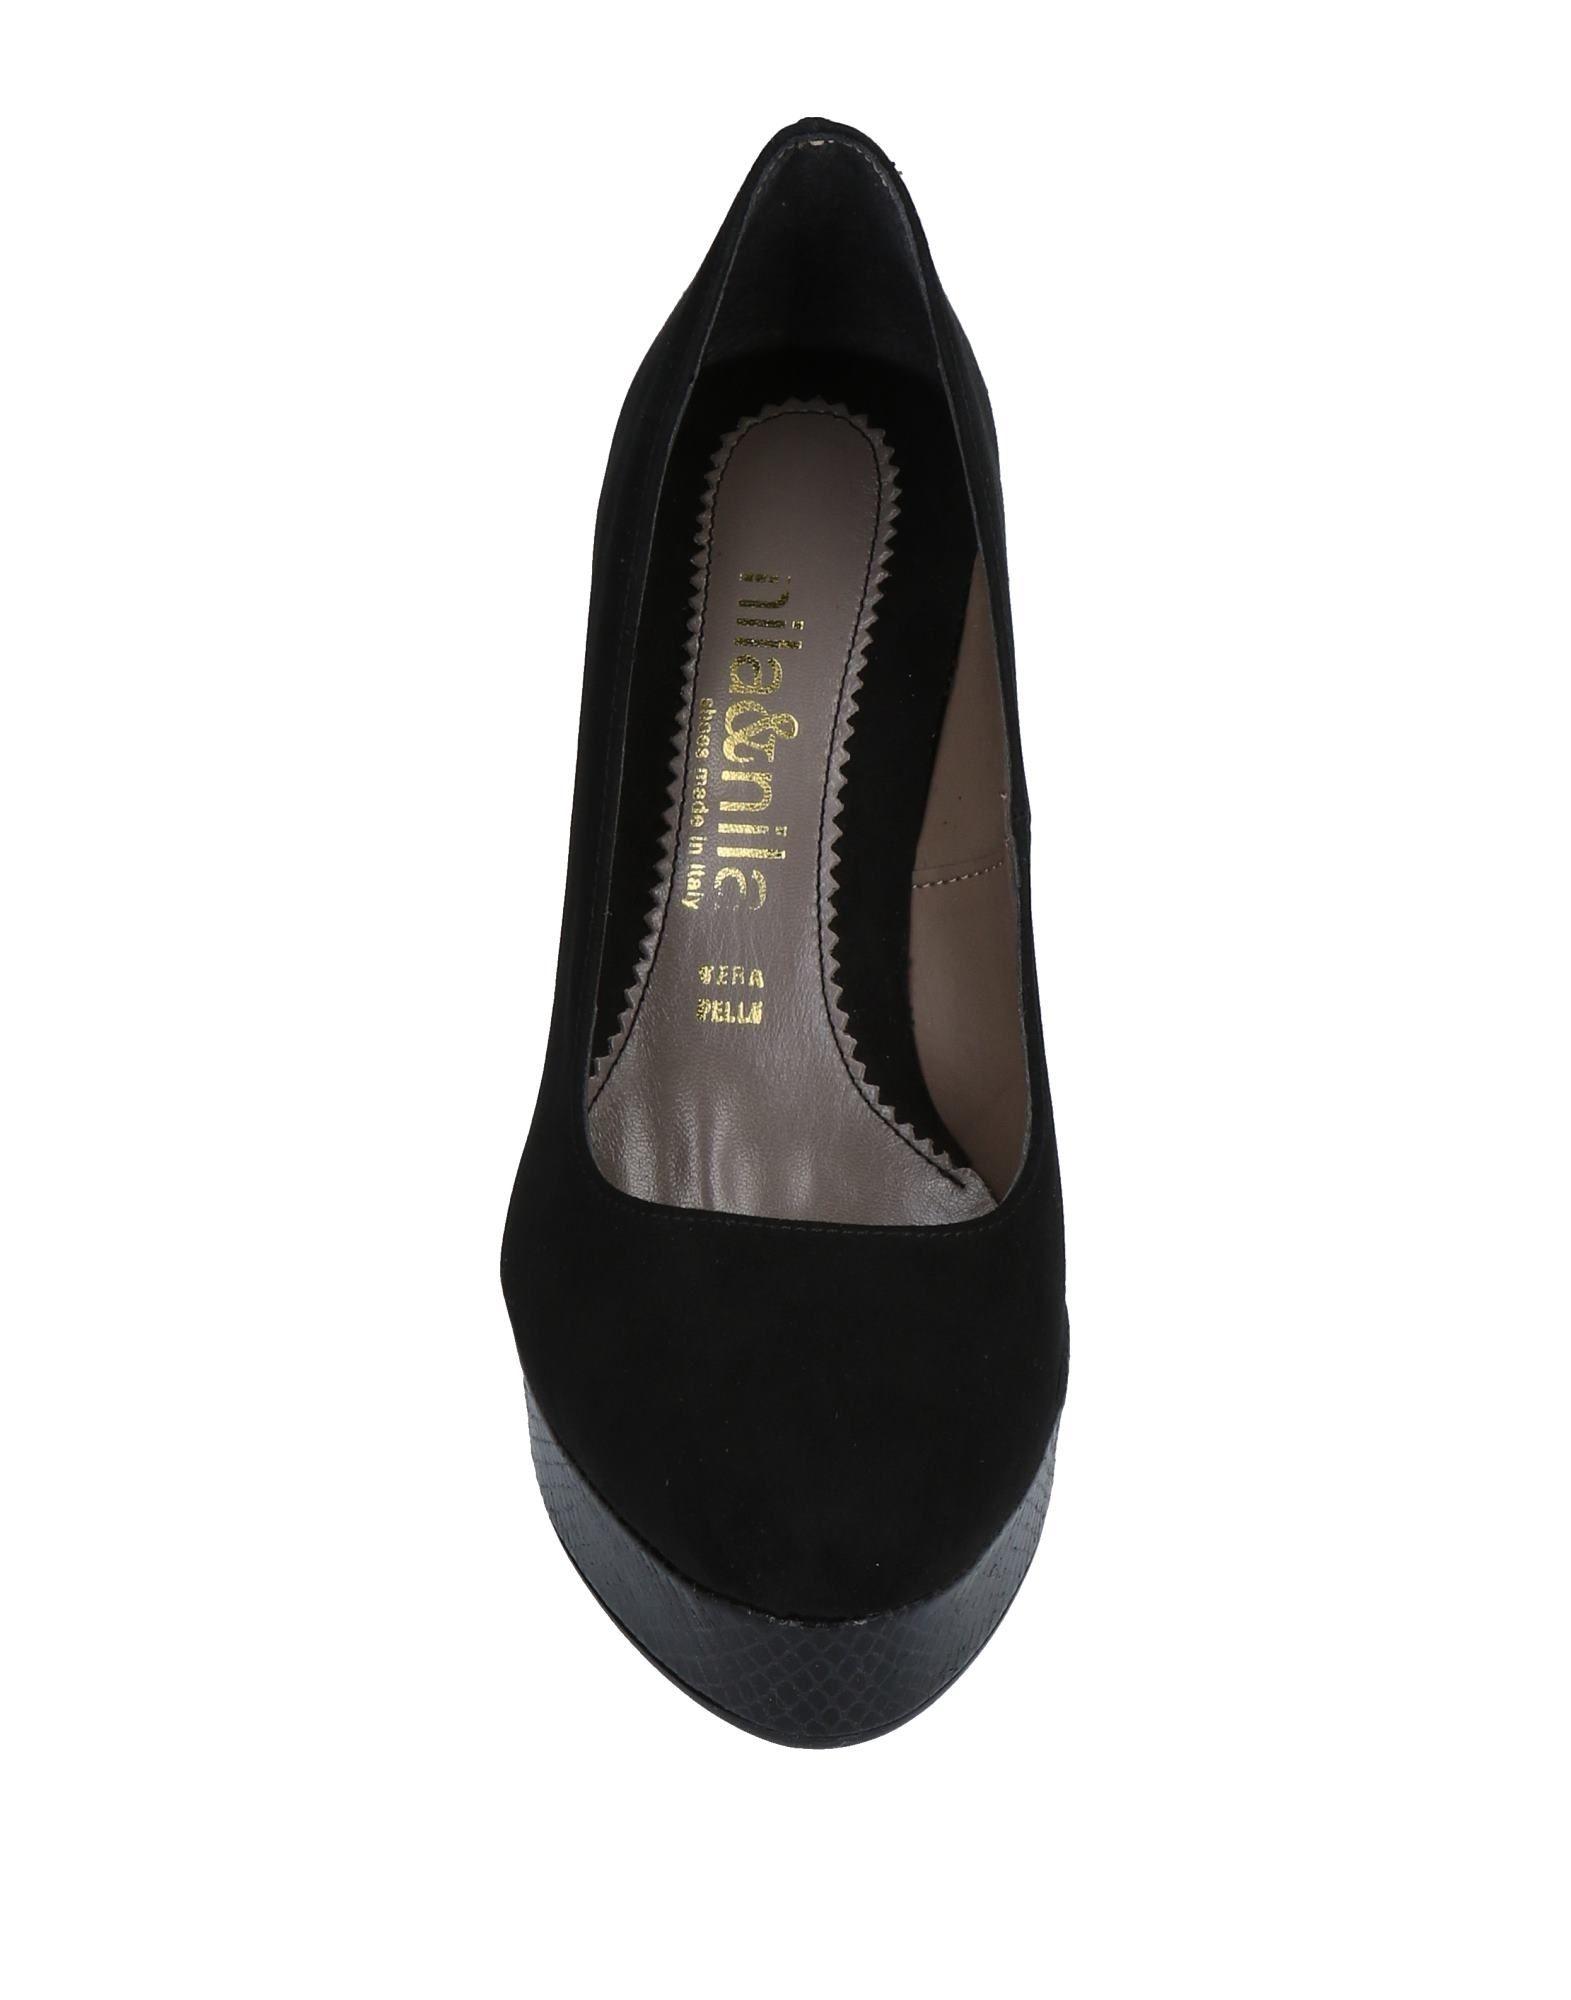 Nila & Gute Nila Pumps Damen  11265381OU Gute & Qualität beliebte Schuhe 491f3b